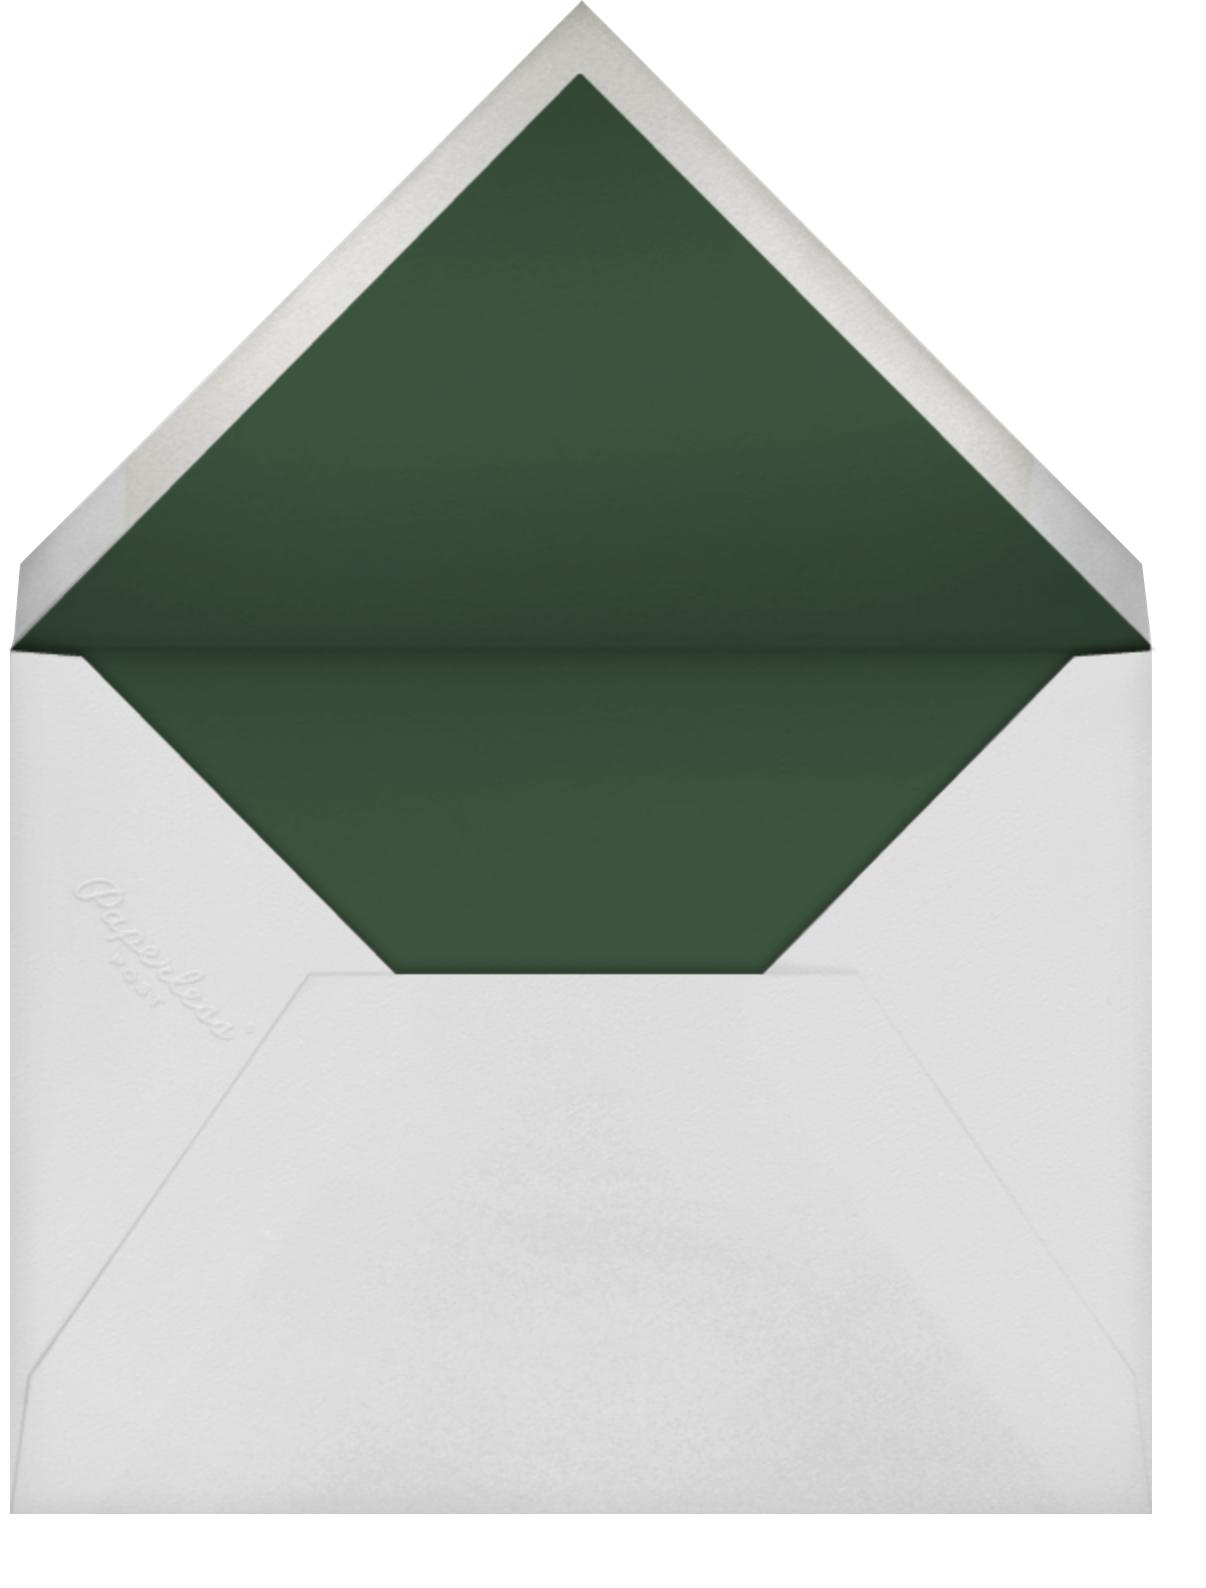 Climbing Poppies - Oscar de la Renta - Thank you - envelope back